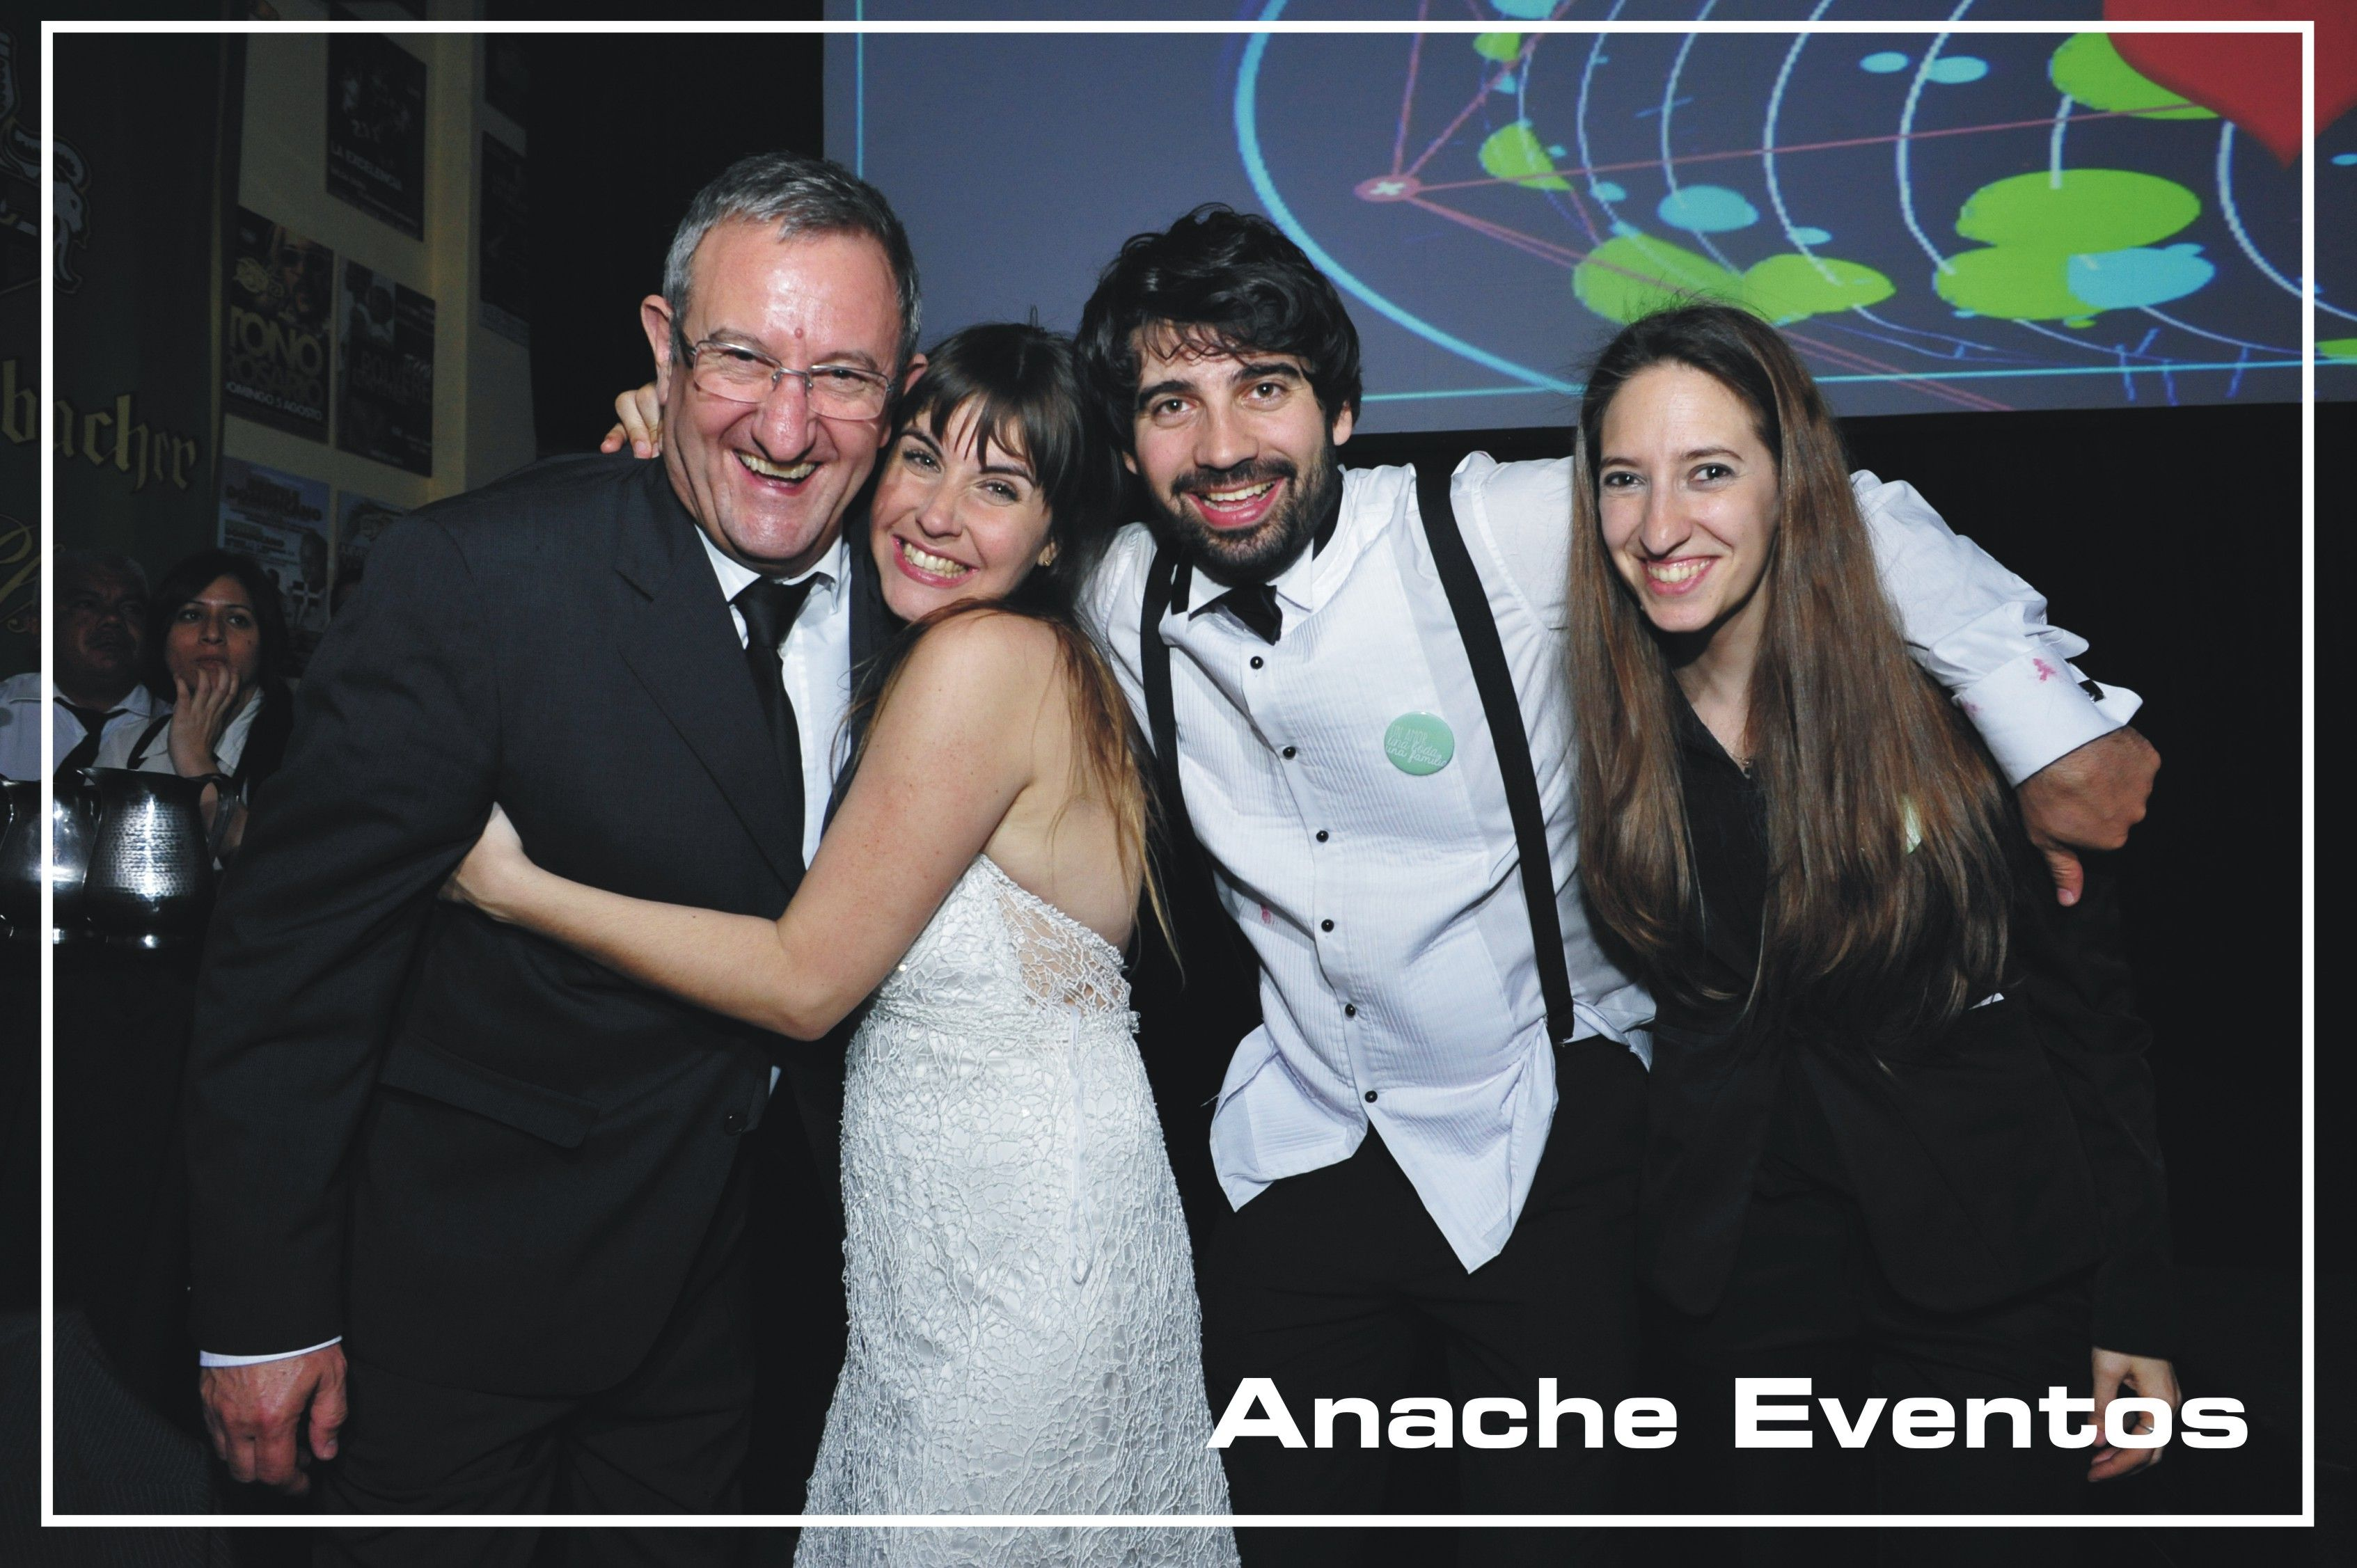 Equipo con Novios - Anache Eventos  - Quilmes - Bs As - Argentina (011) 4257-2874 - www.anache.com.ar #supplies #party #fiesta #eventos #shows #cotillon #animacion #entretenimiento #organizaciondeeventos #planners